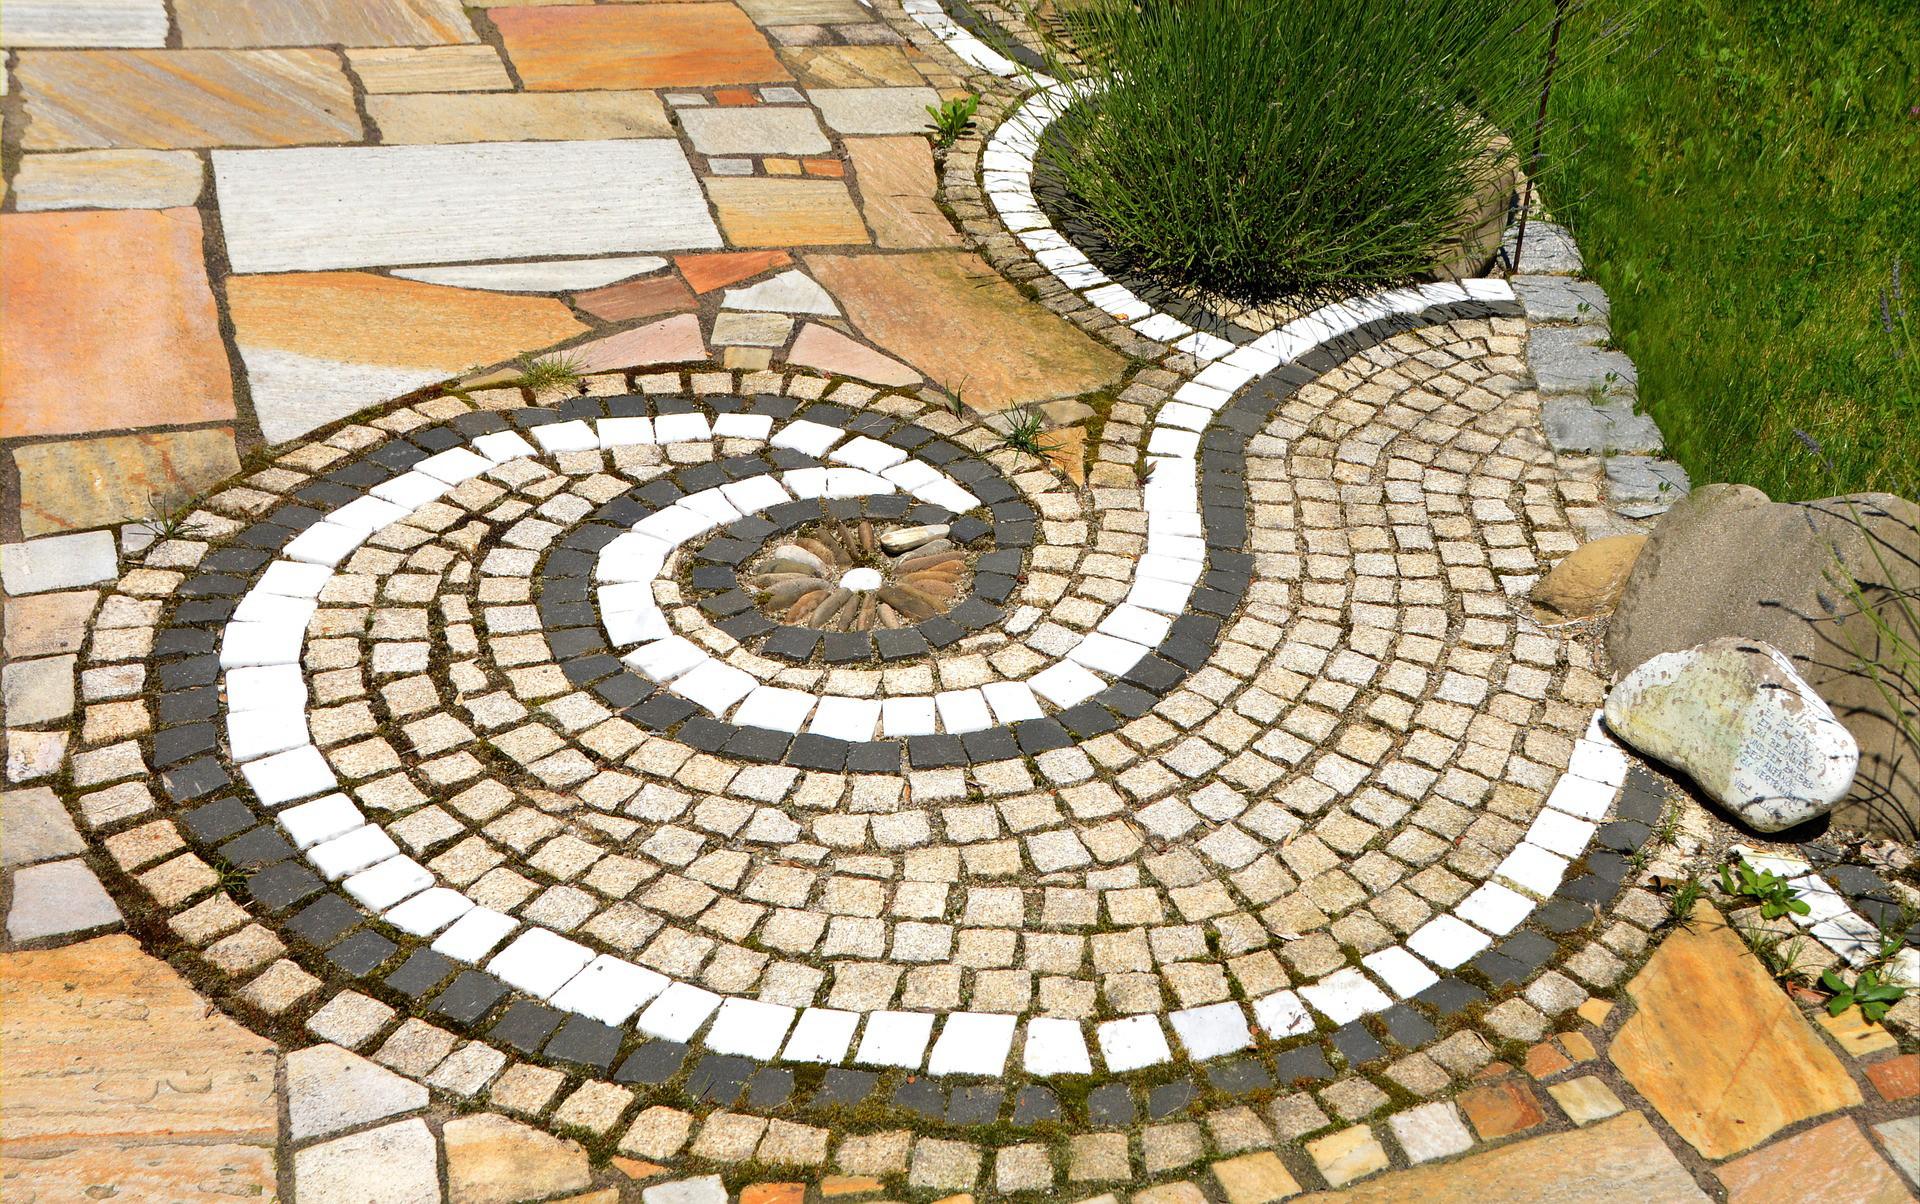 garden 1505046 1920 alan browne landscaping ForGarden Design 1920 S